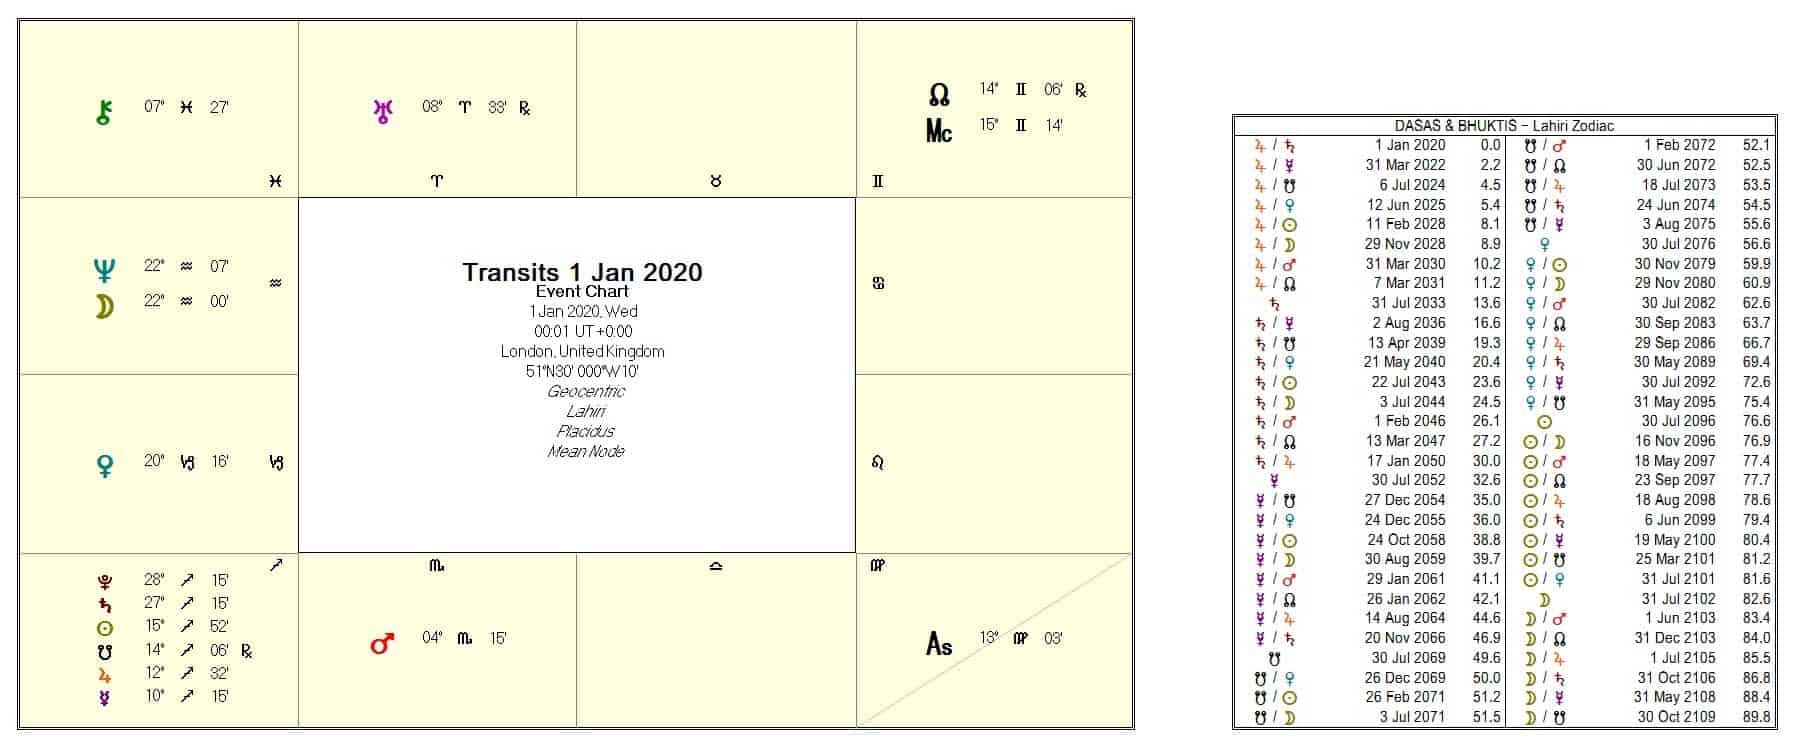 1st January 2020 Vedic chart